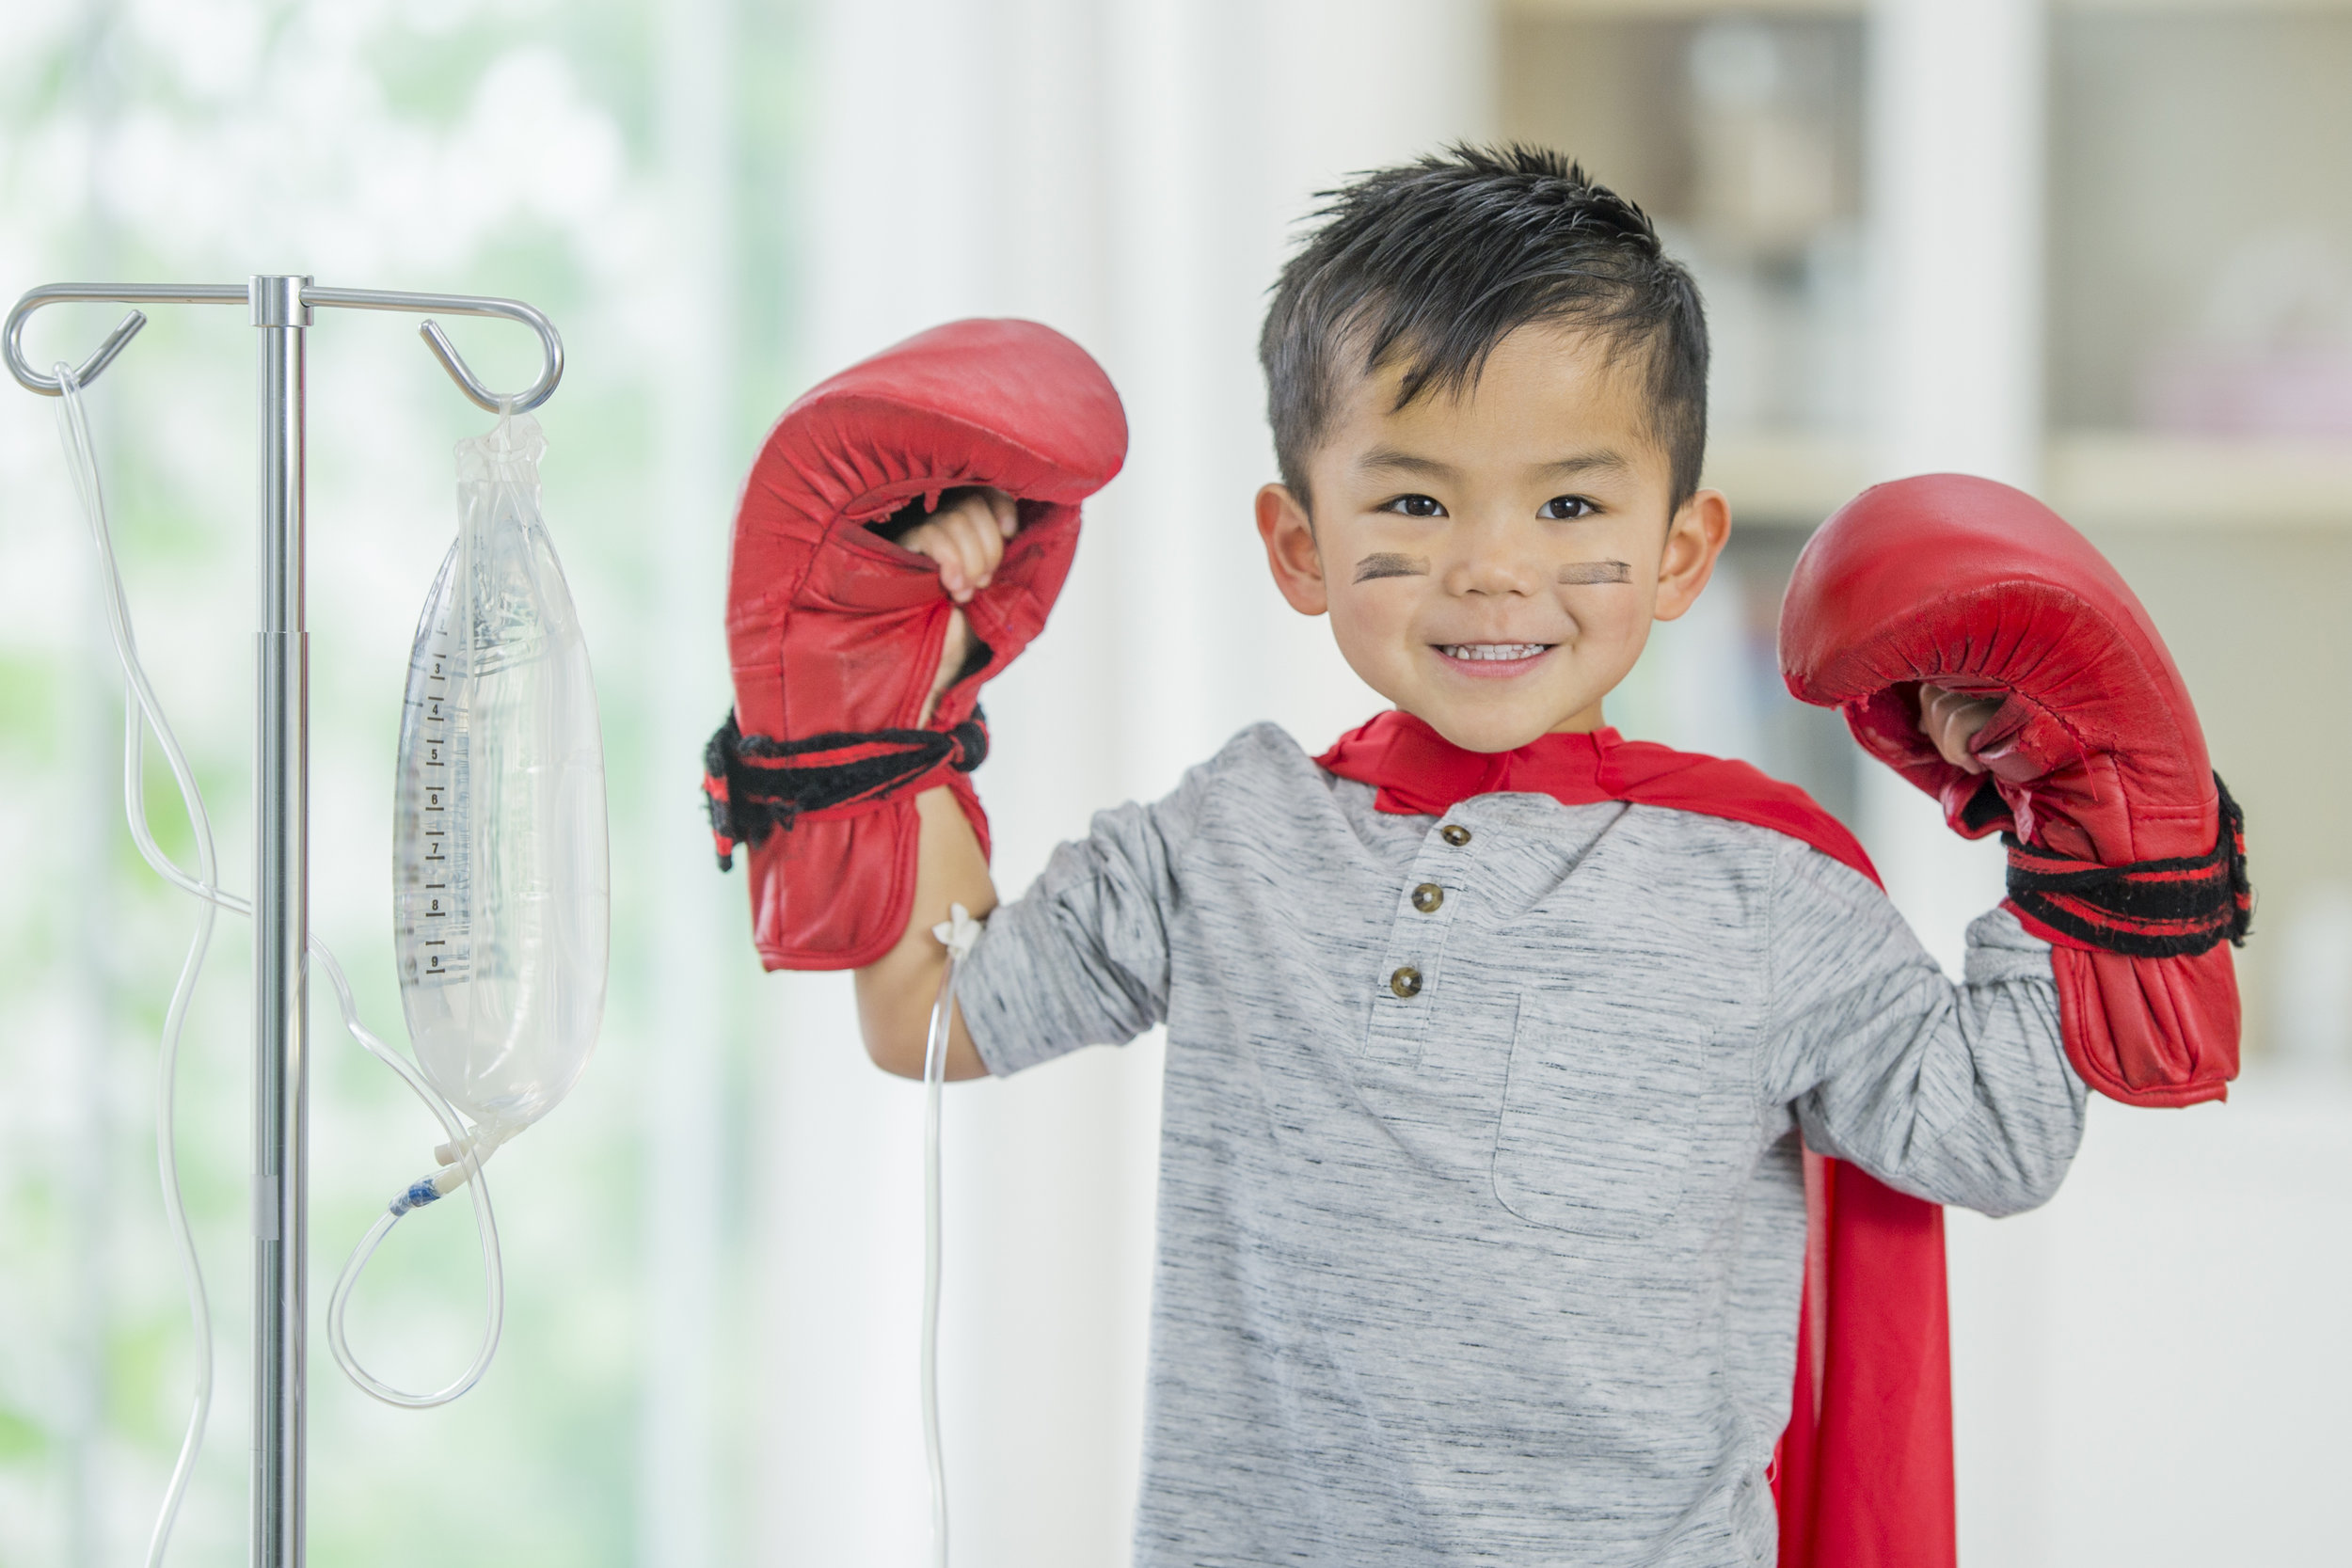 Together we will help children fight cancer.